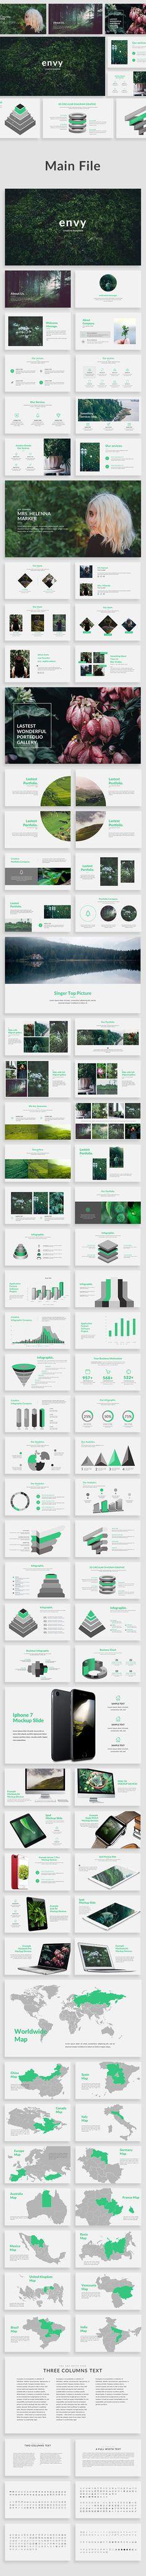 Envy - Creative Google Slide Template - Google Slides Presentation Templates